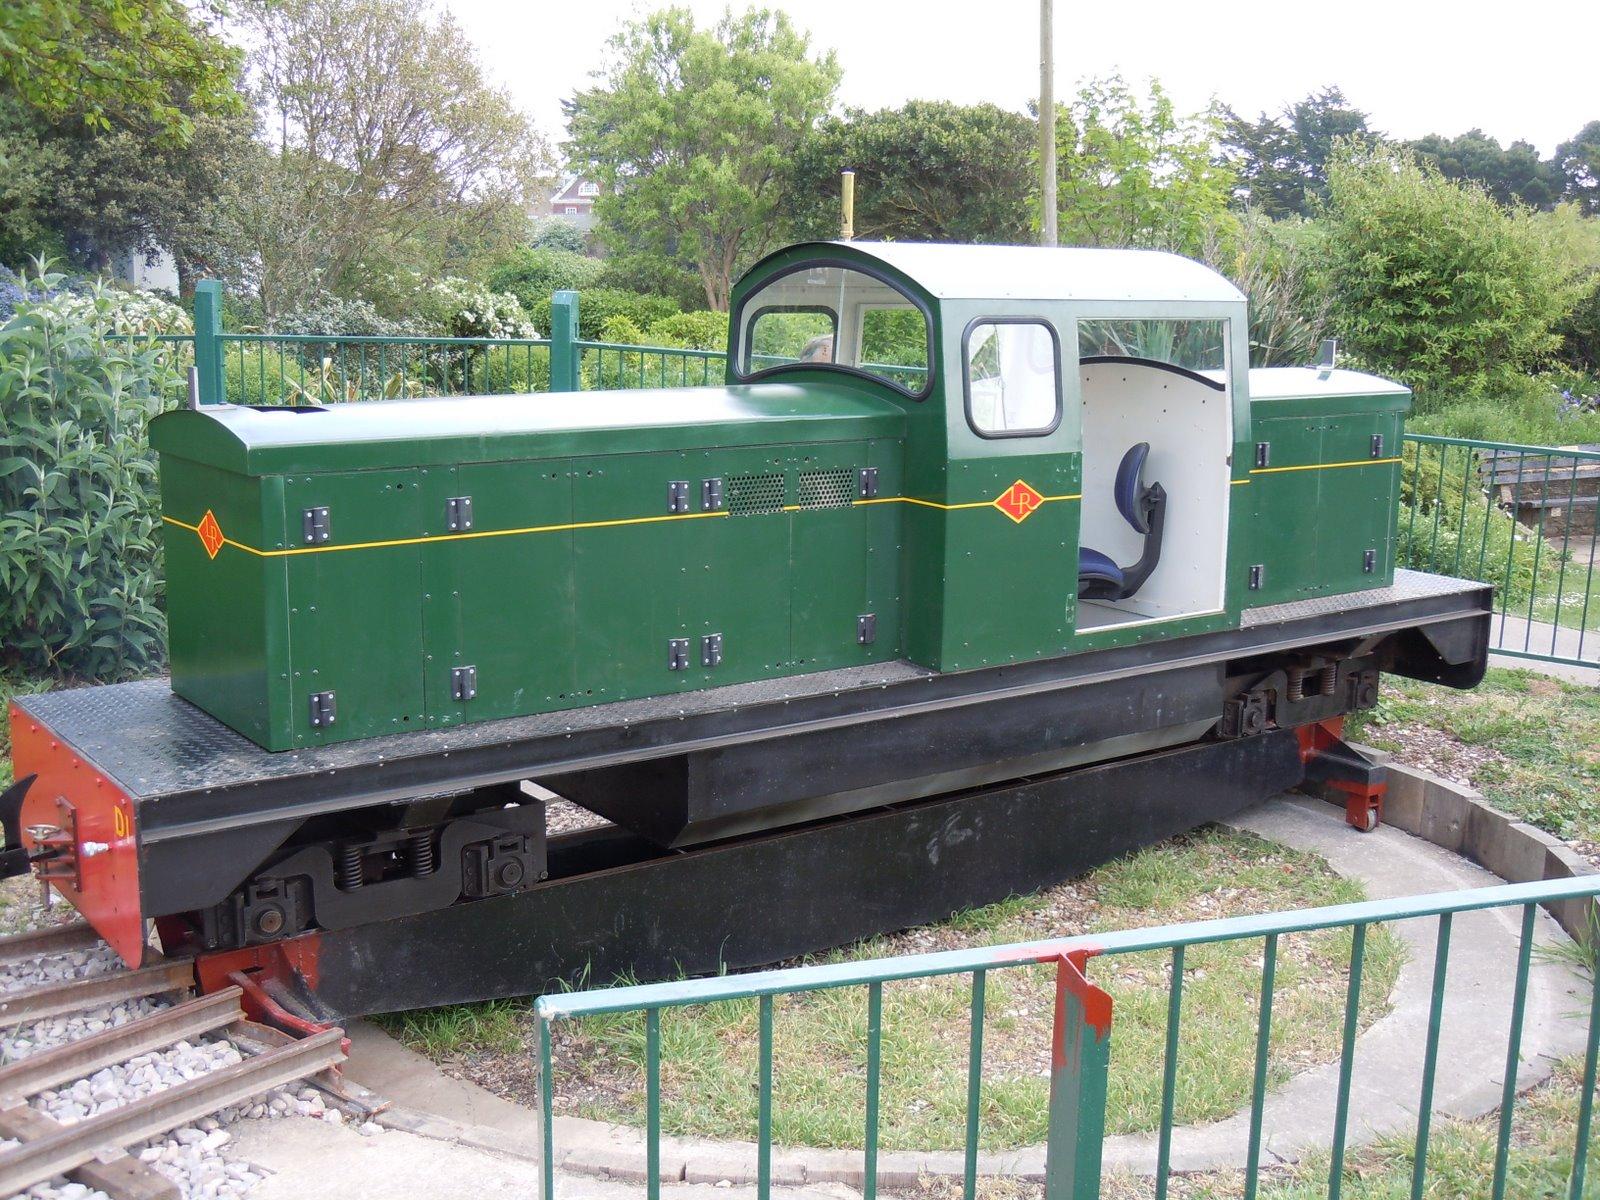 Michael's Model Railways: Return to Littlehampton